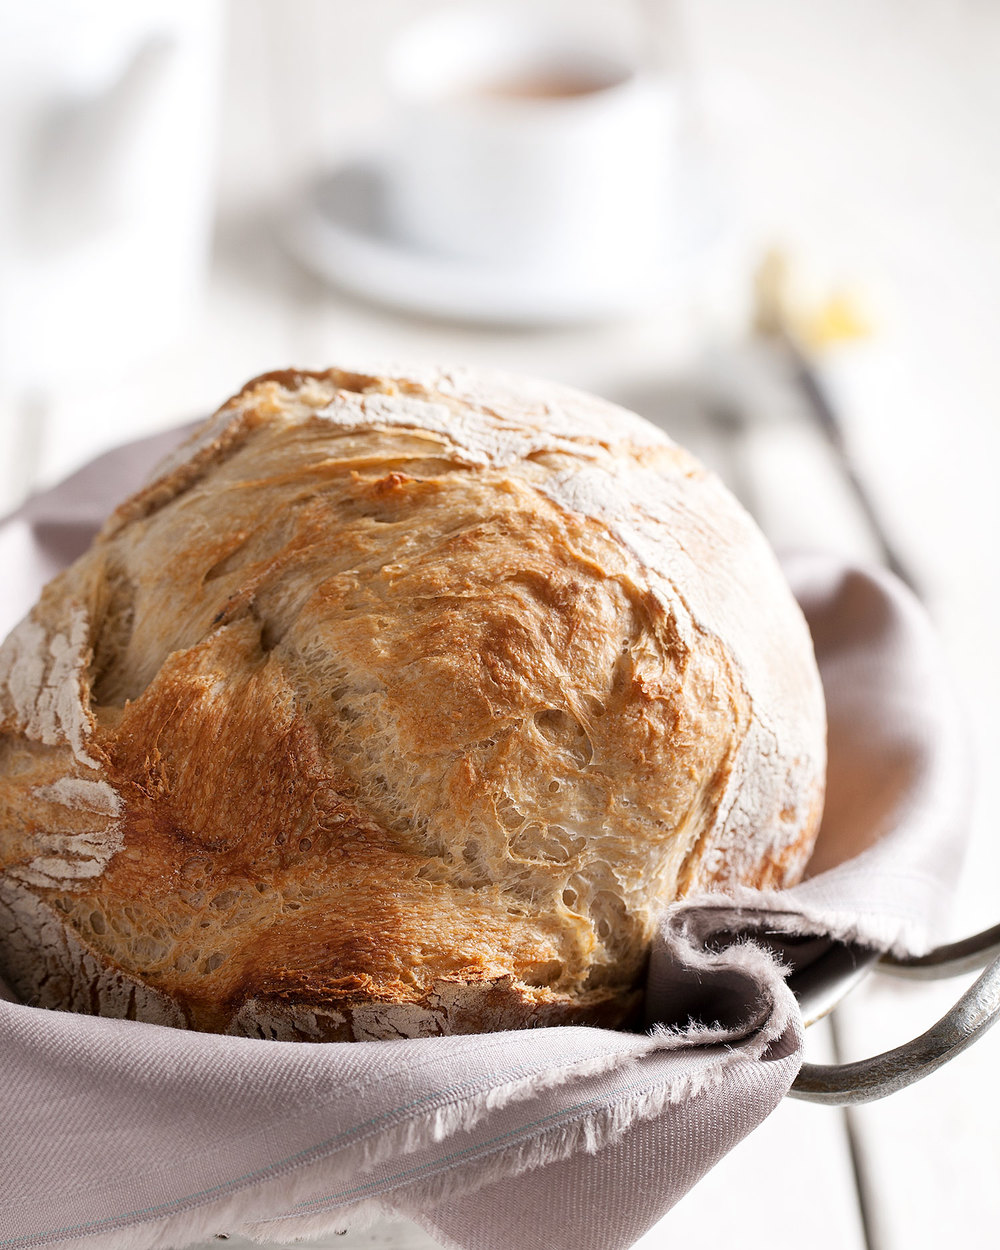 corina-landa-food-photography-fotografia-gastronomica-49.jpg